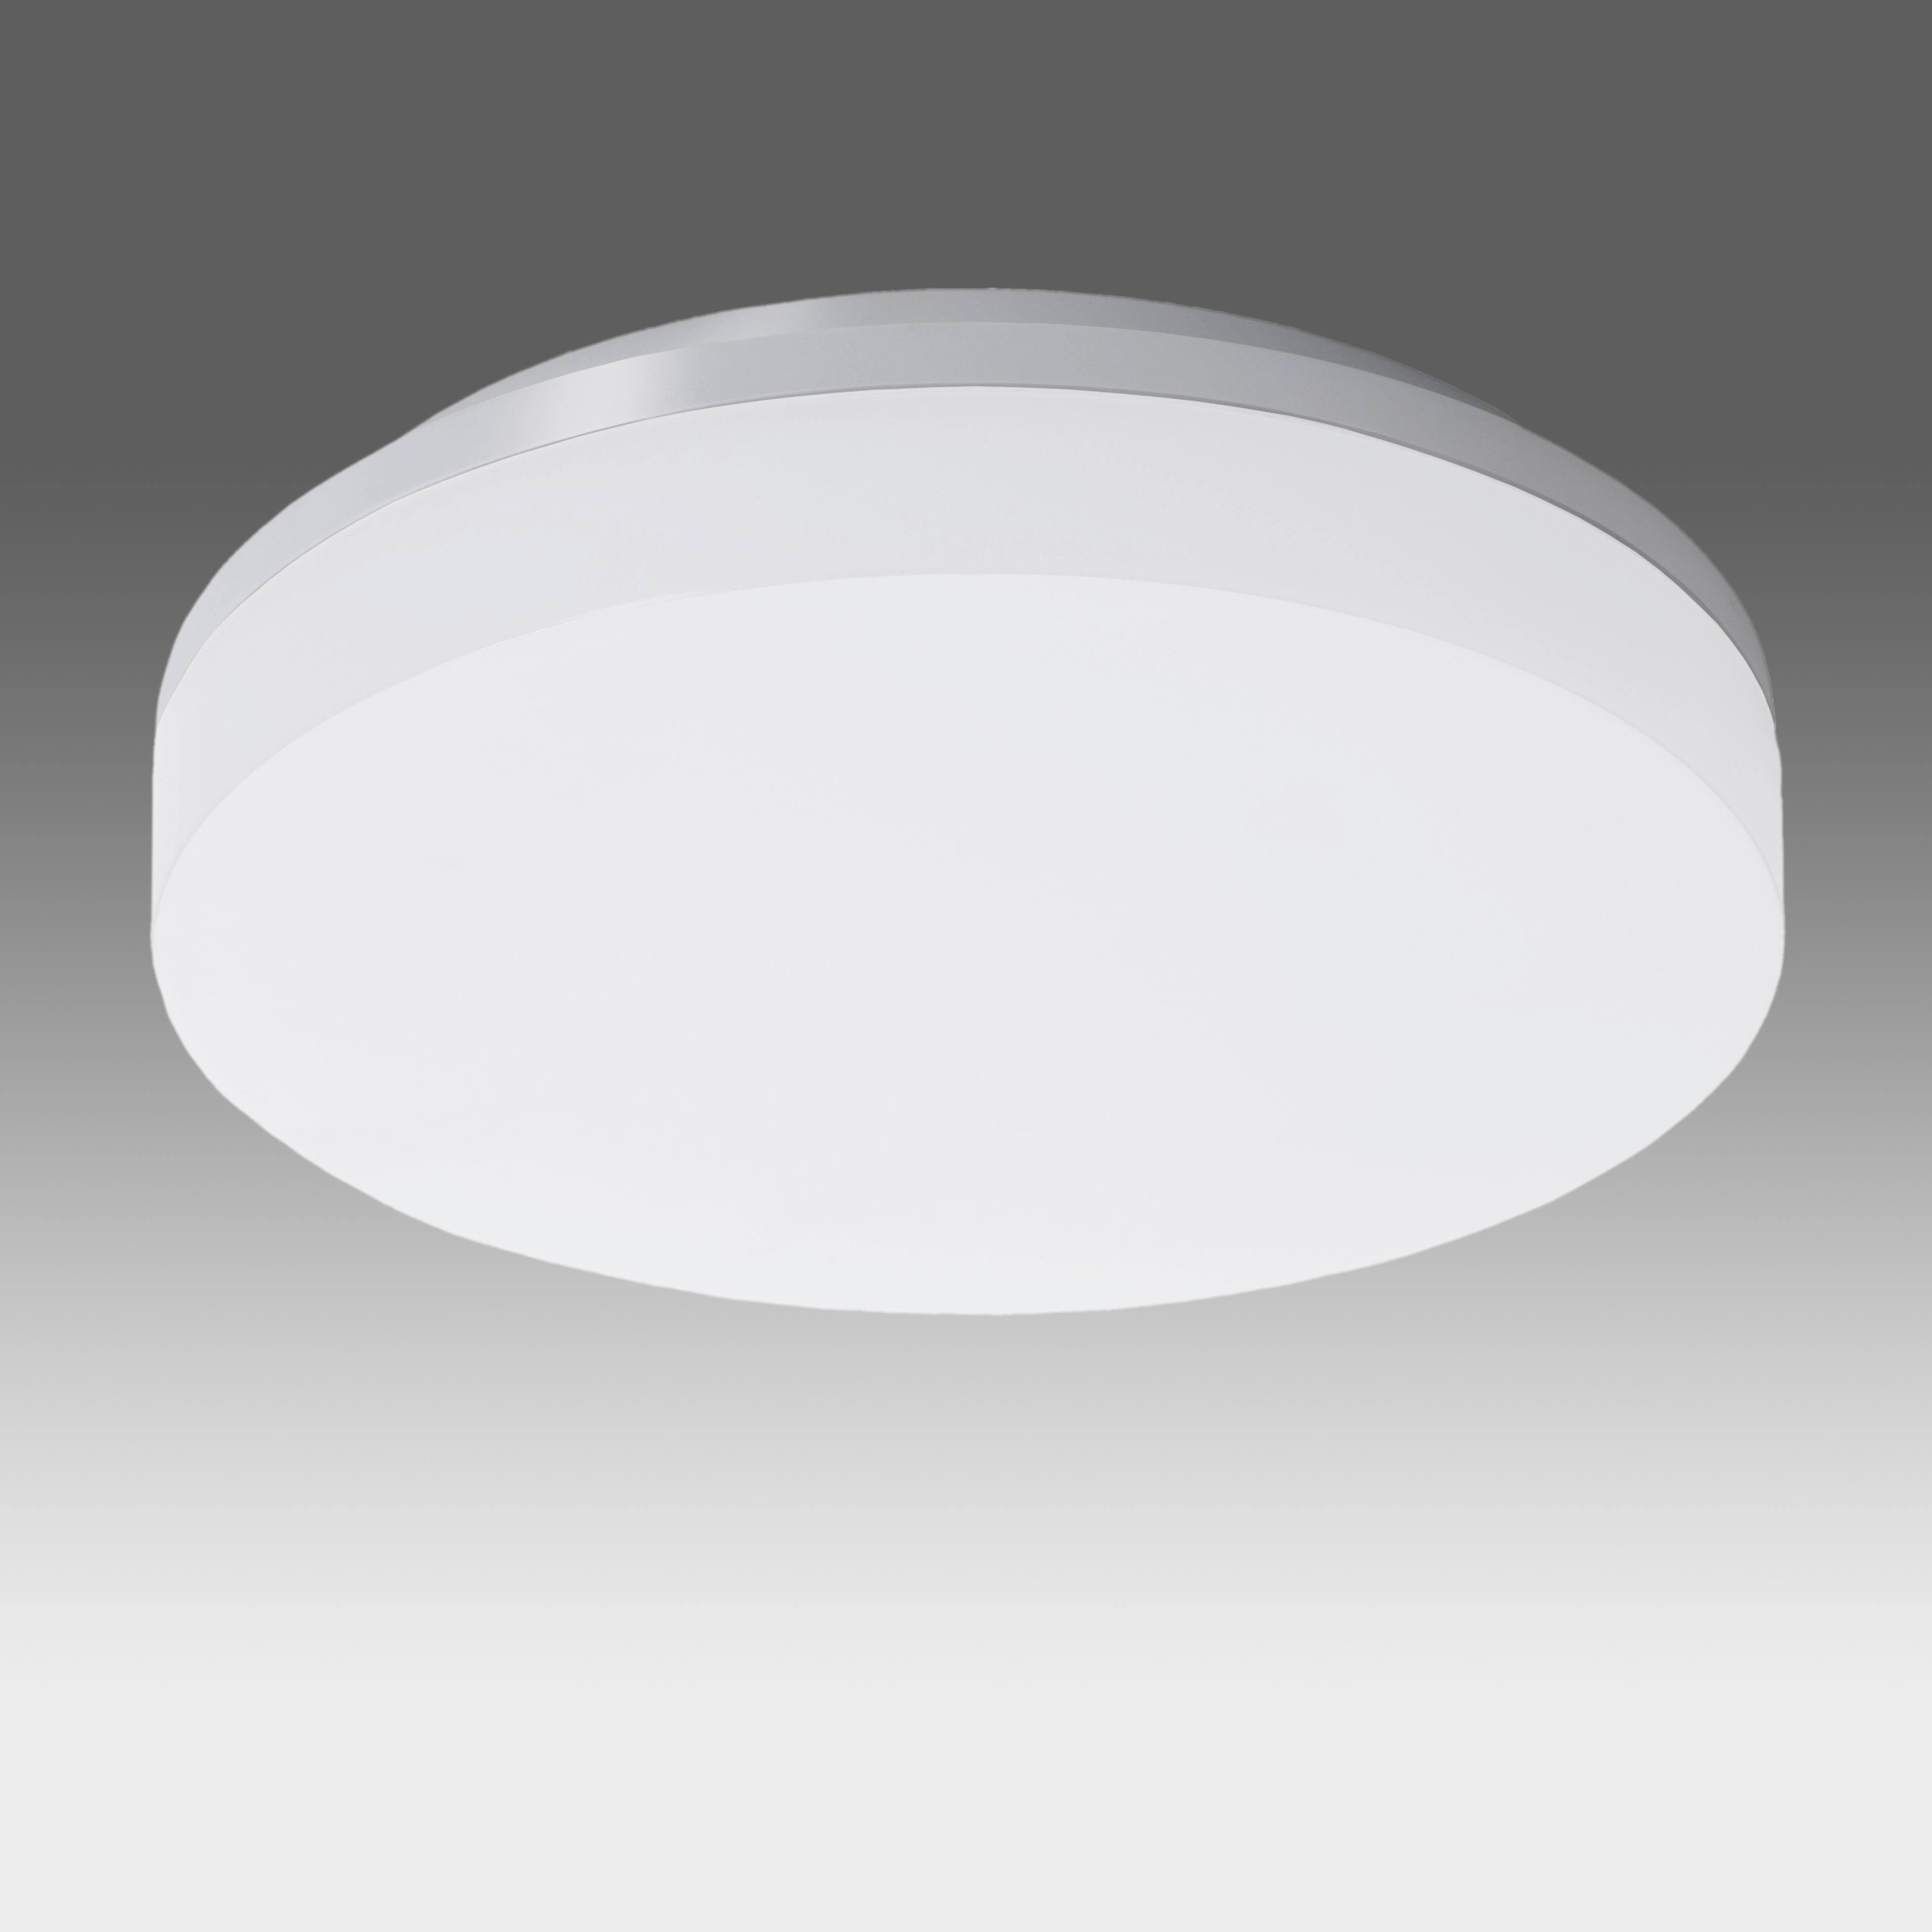 1 Stk Elegance Round II 15W 1500lm 3000K Triac Dim IP44 silber LILE0006--